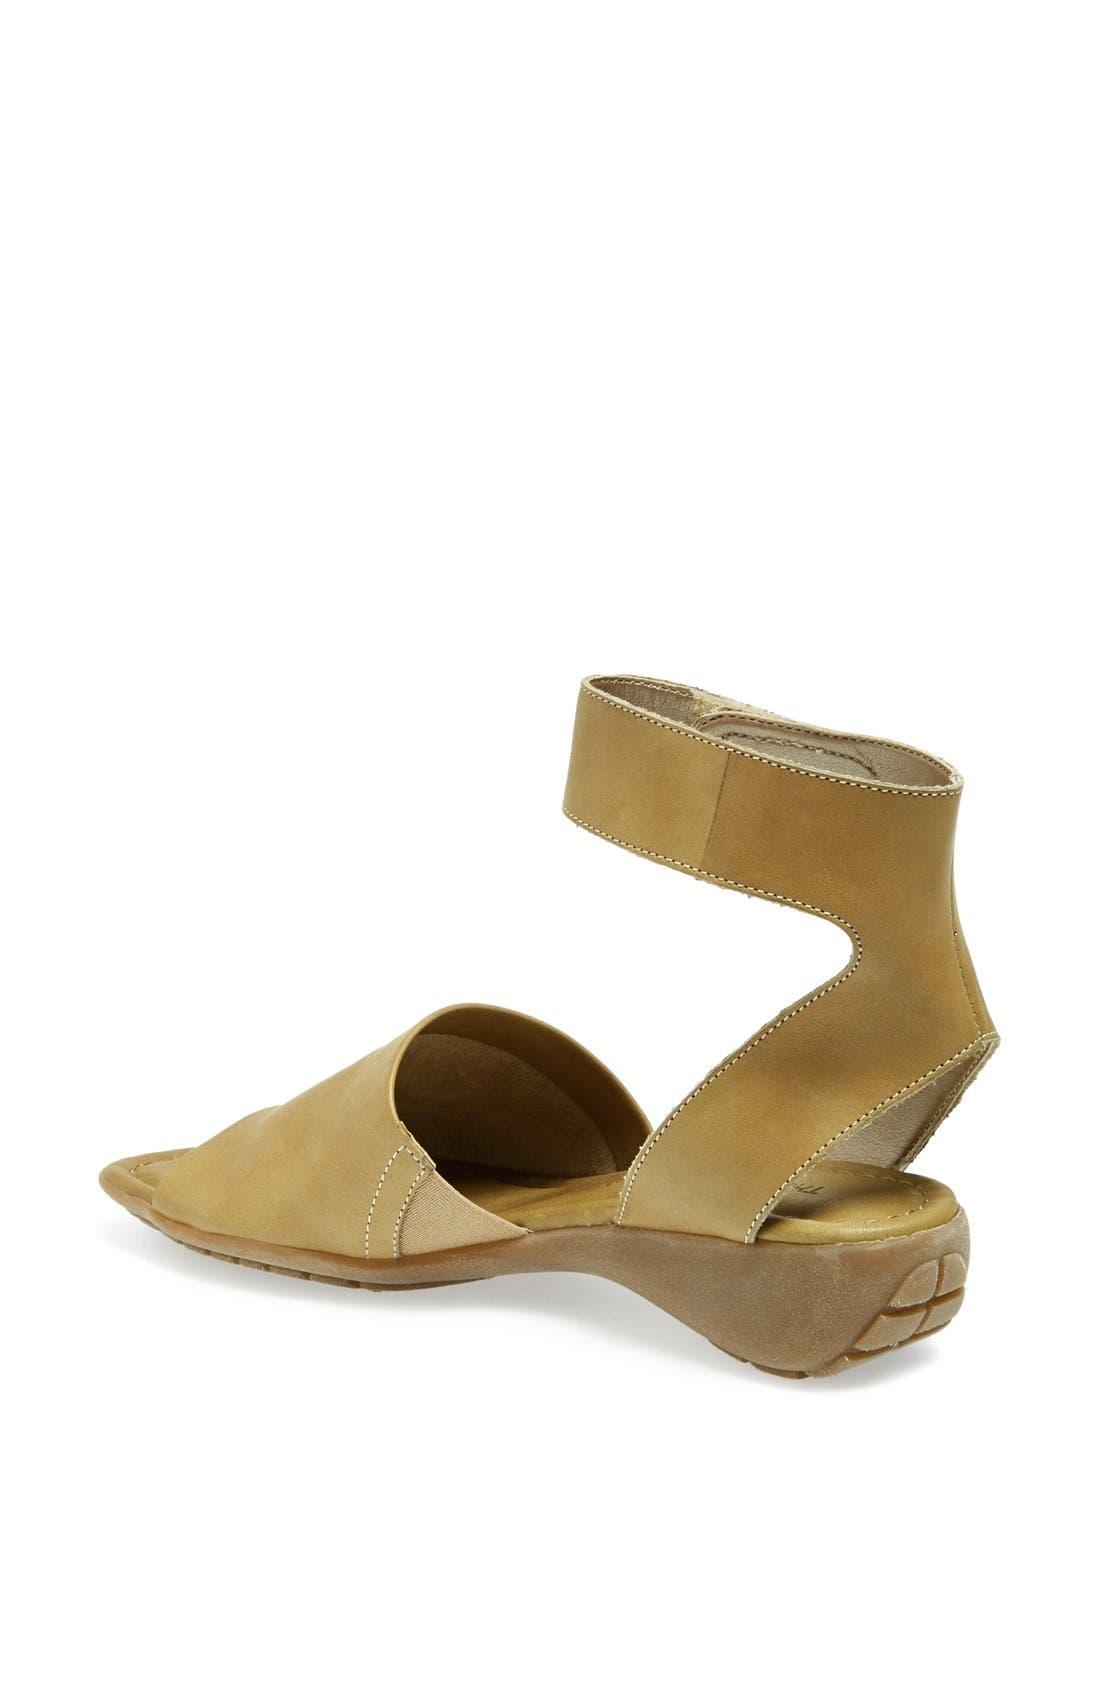 'Beglad' Leather Ankle Strap Sandal,                             Alternate thumbnail 29, color,